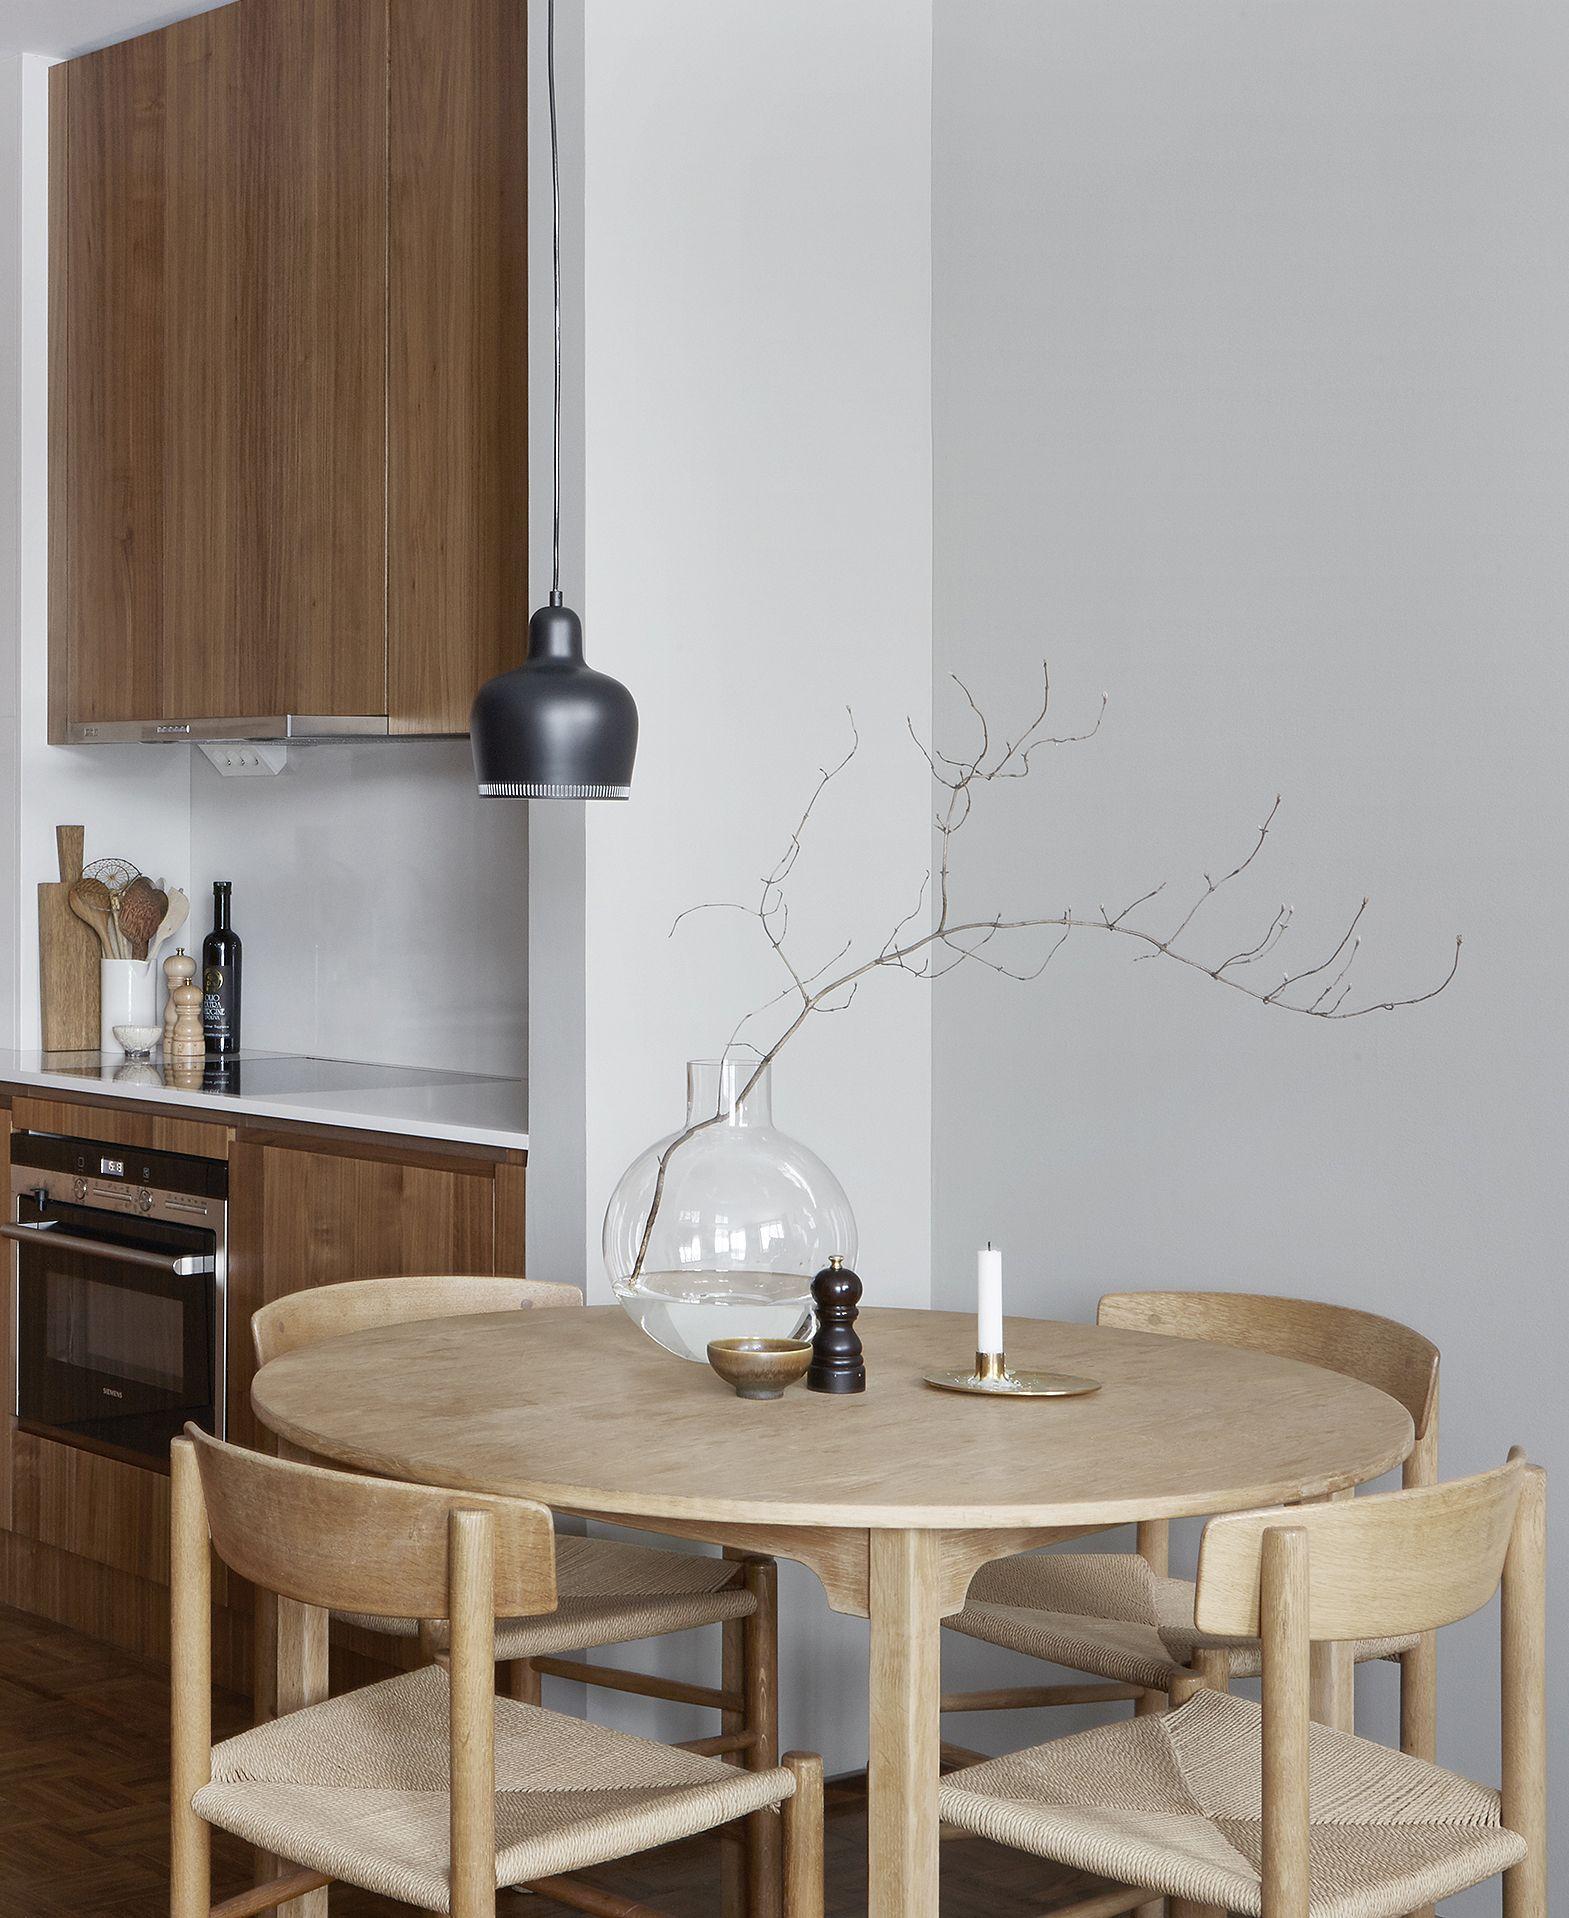 Stylish apartment in wood and grey | Mesa redonda, Cocinas y Mesas